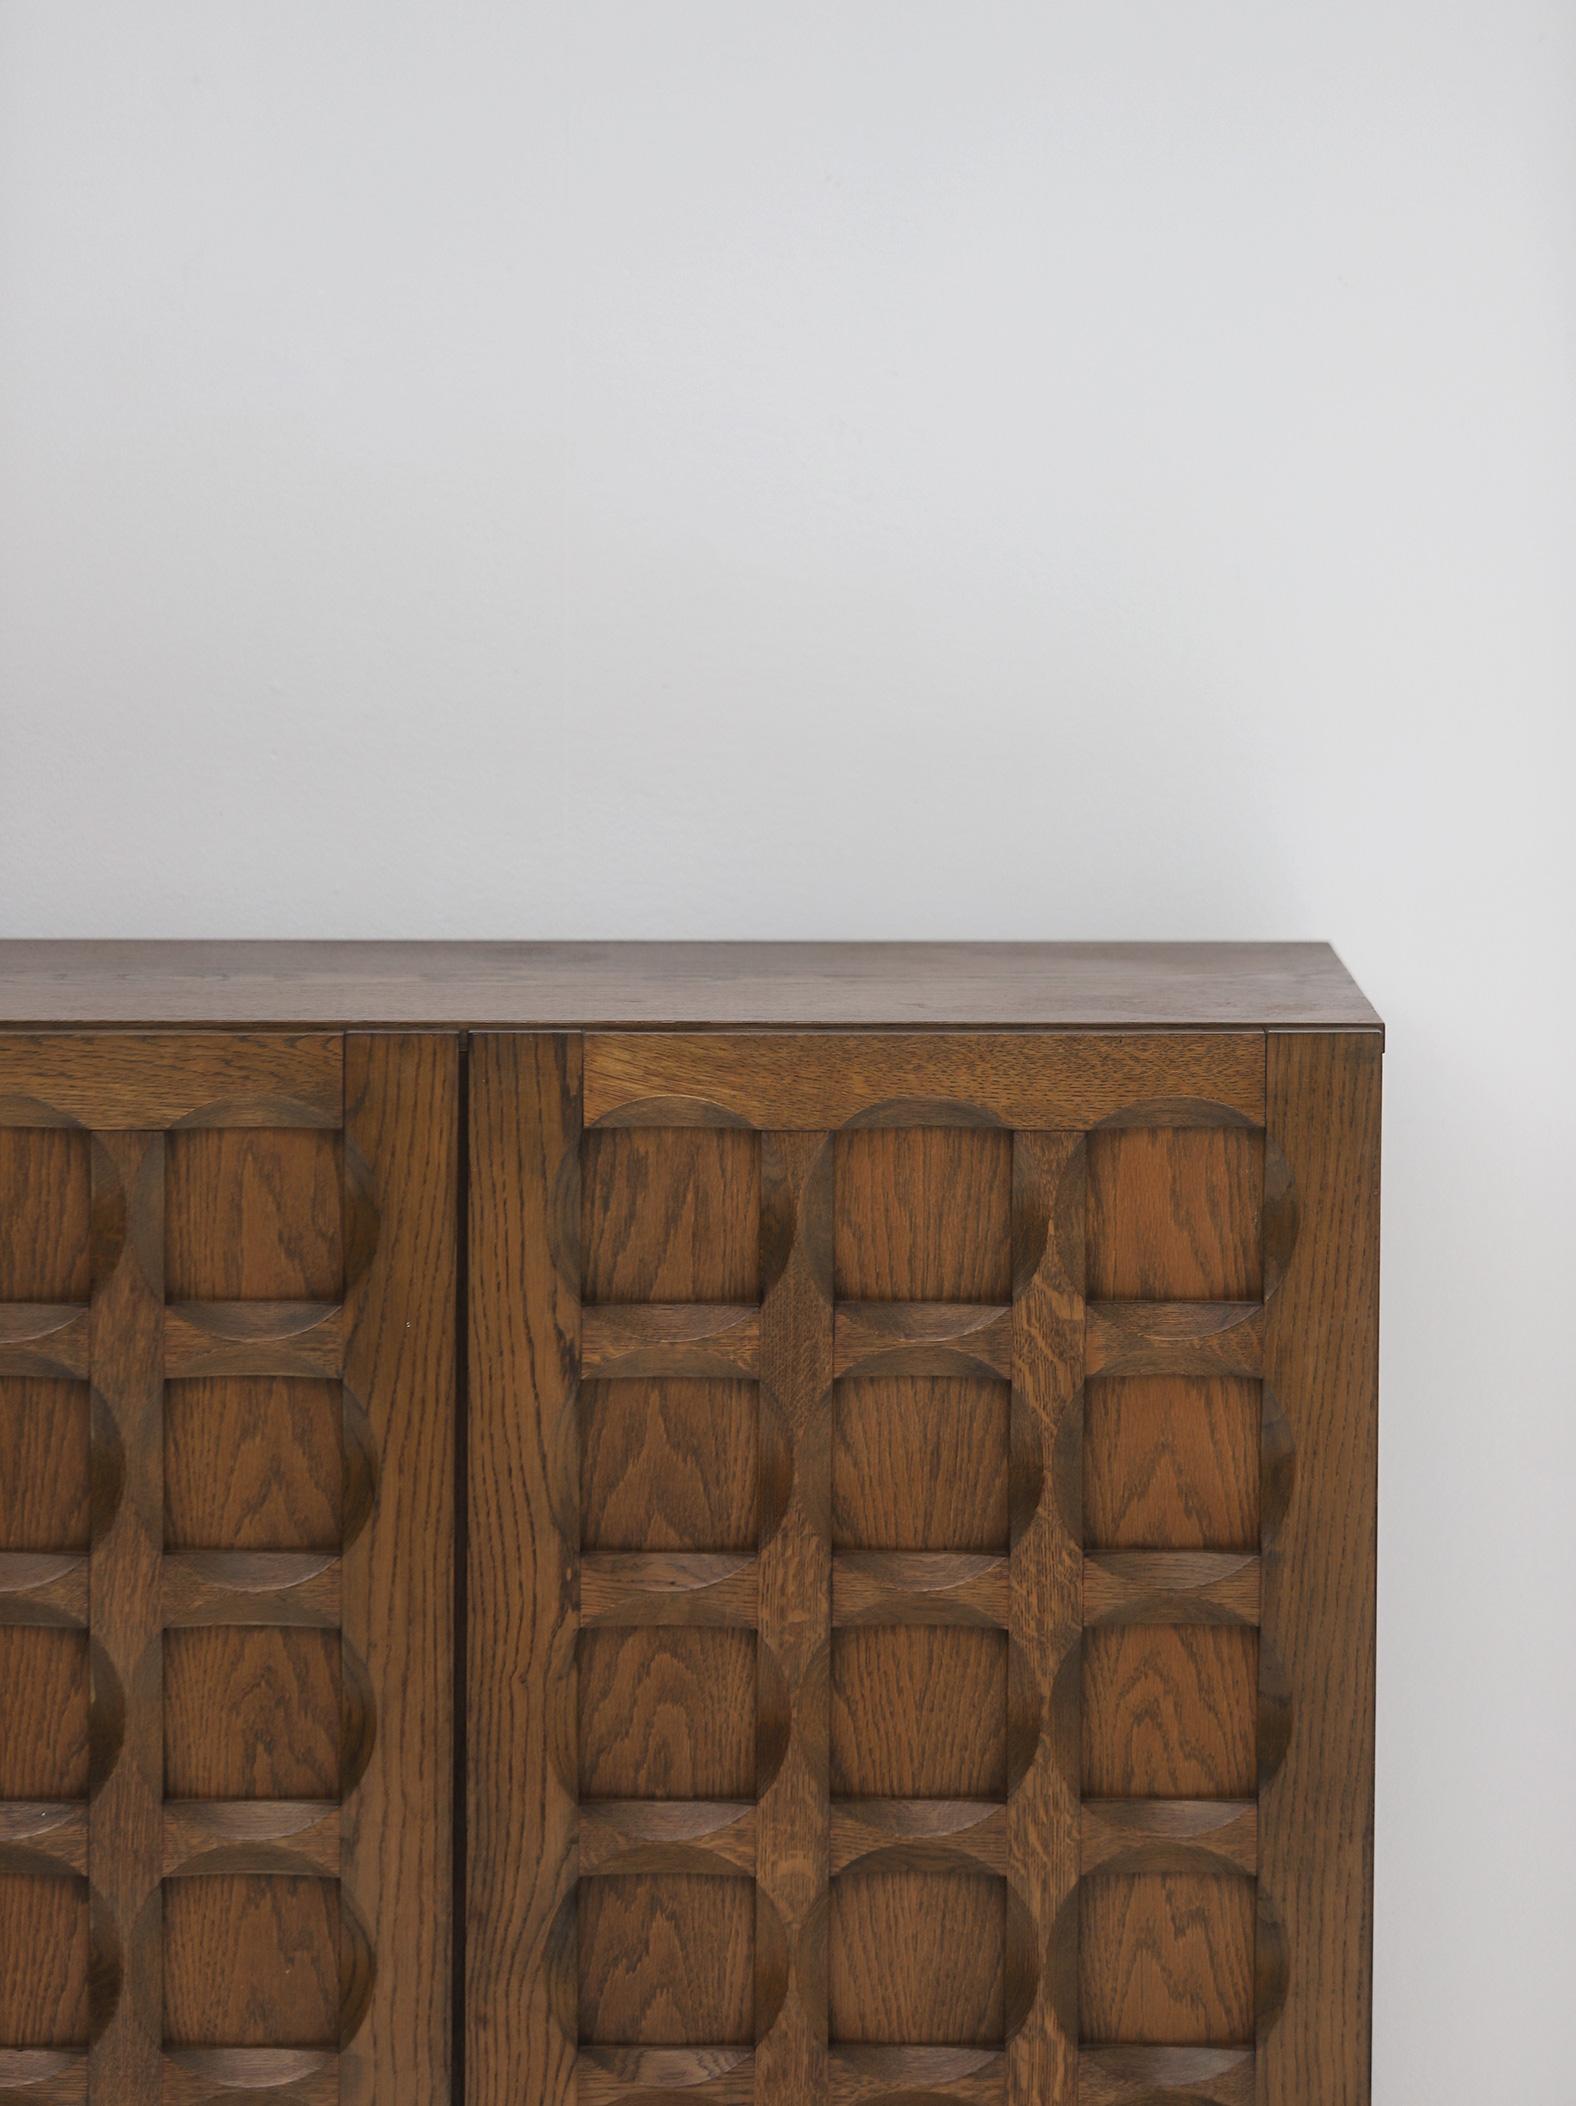 1970s Defour Cabinet Graphical Door Panels image 9